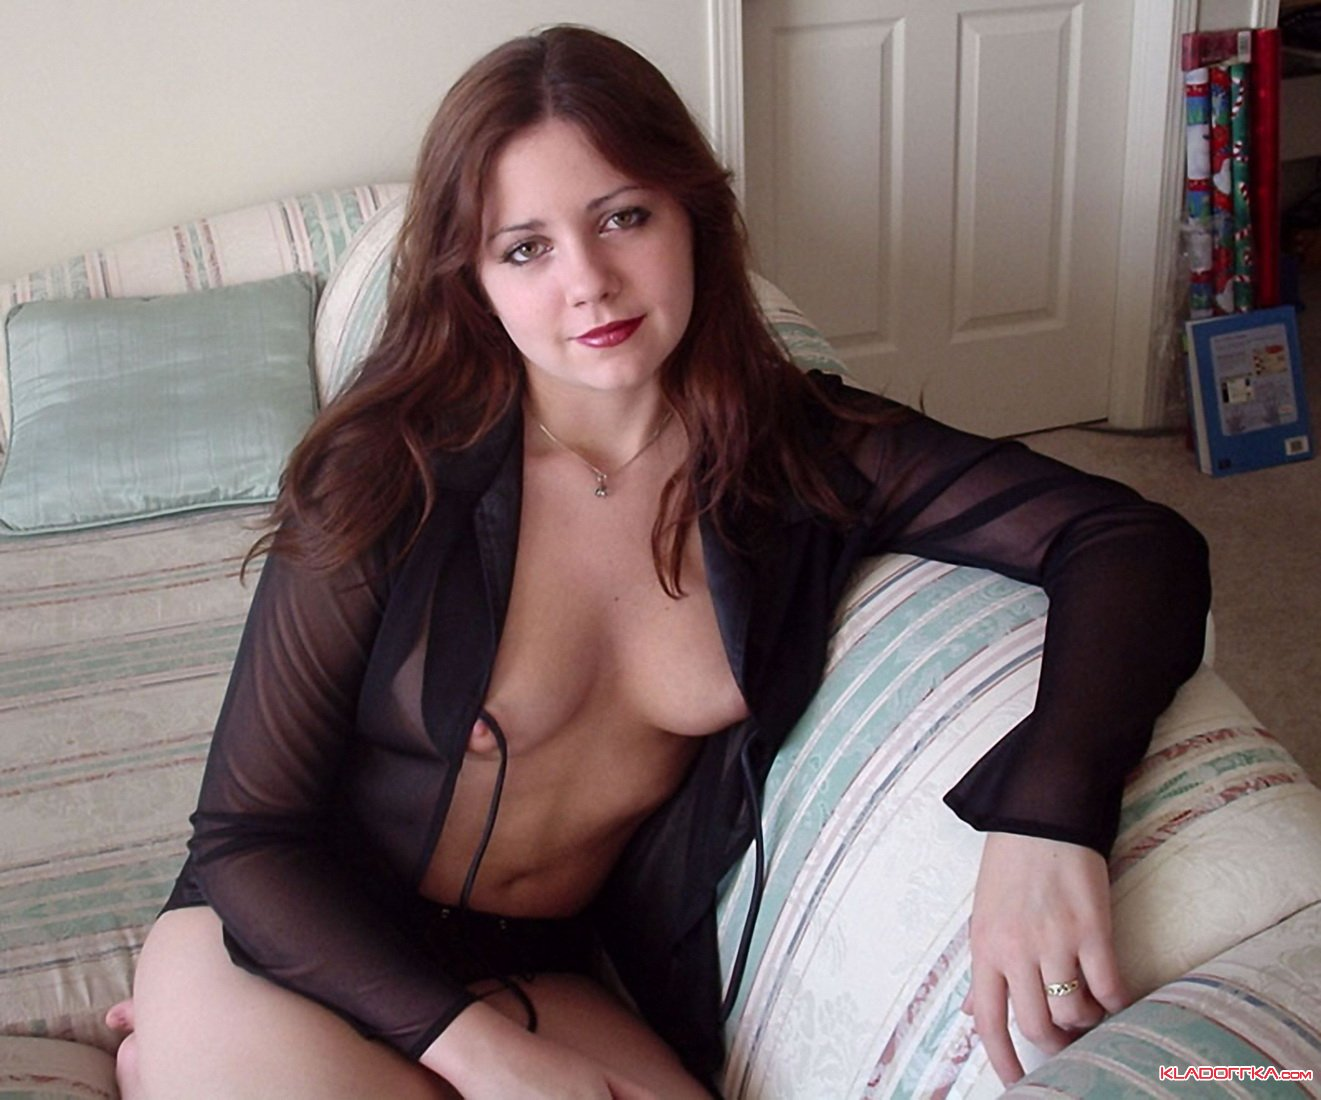 Саша фото голой домашнее рот порно